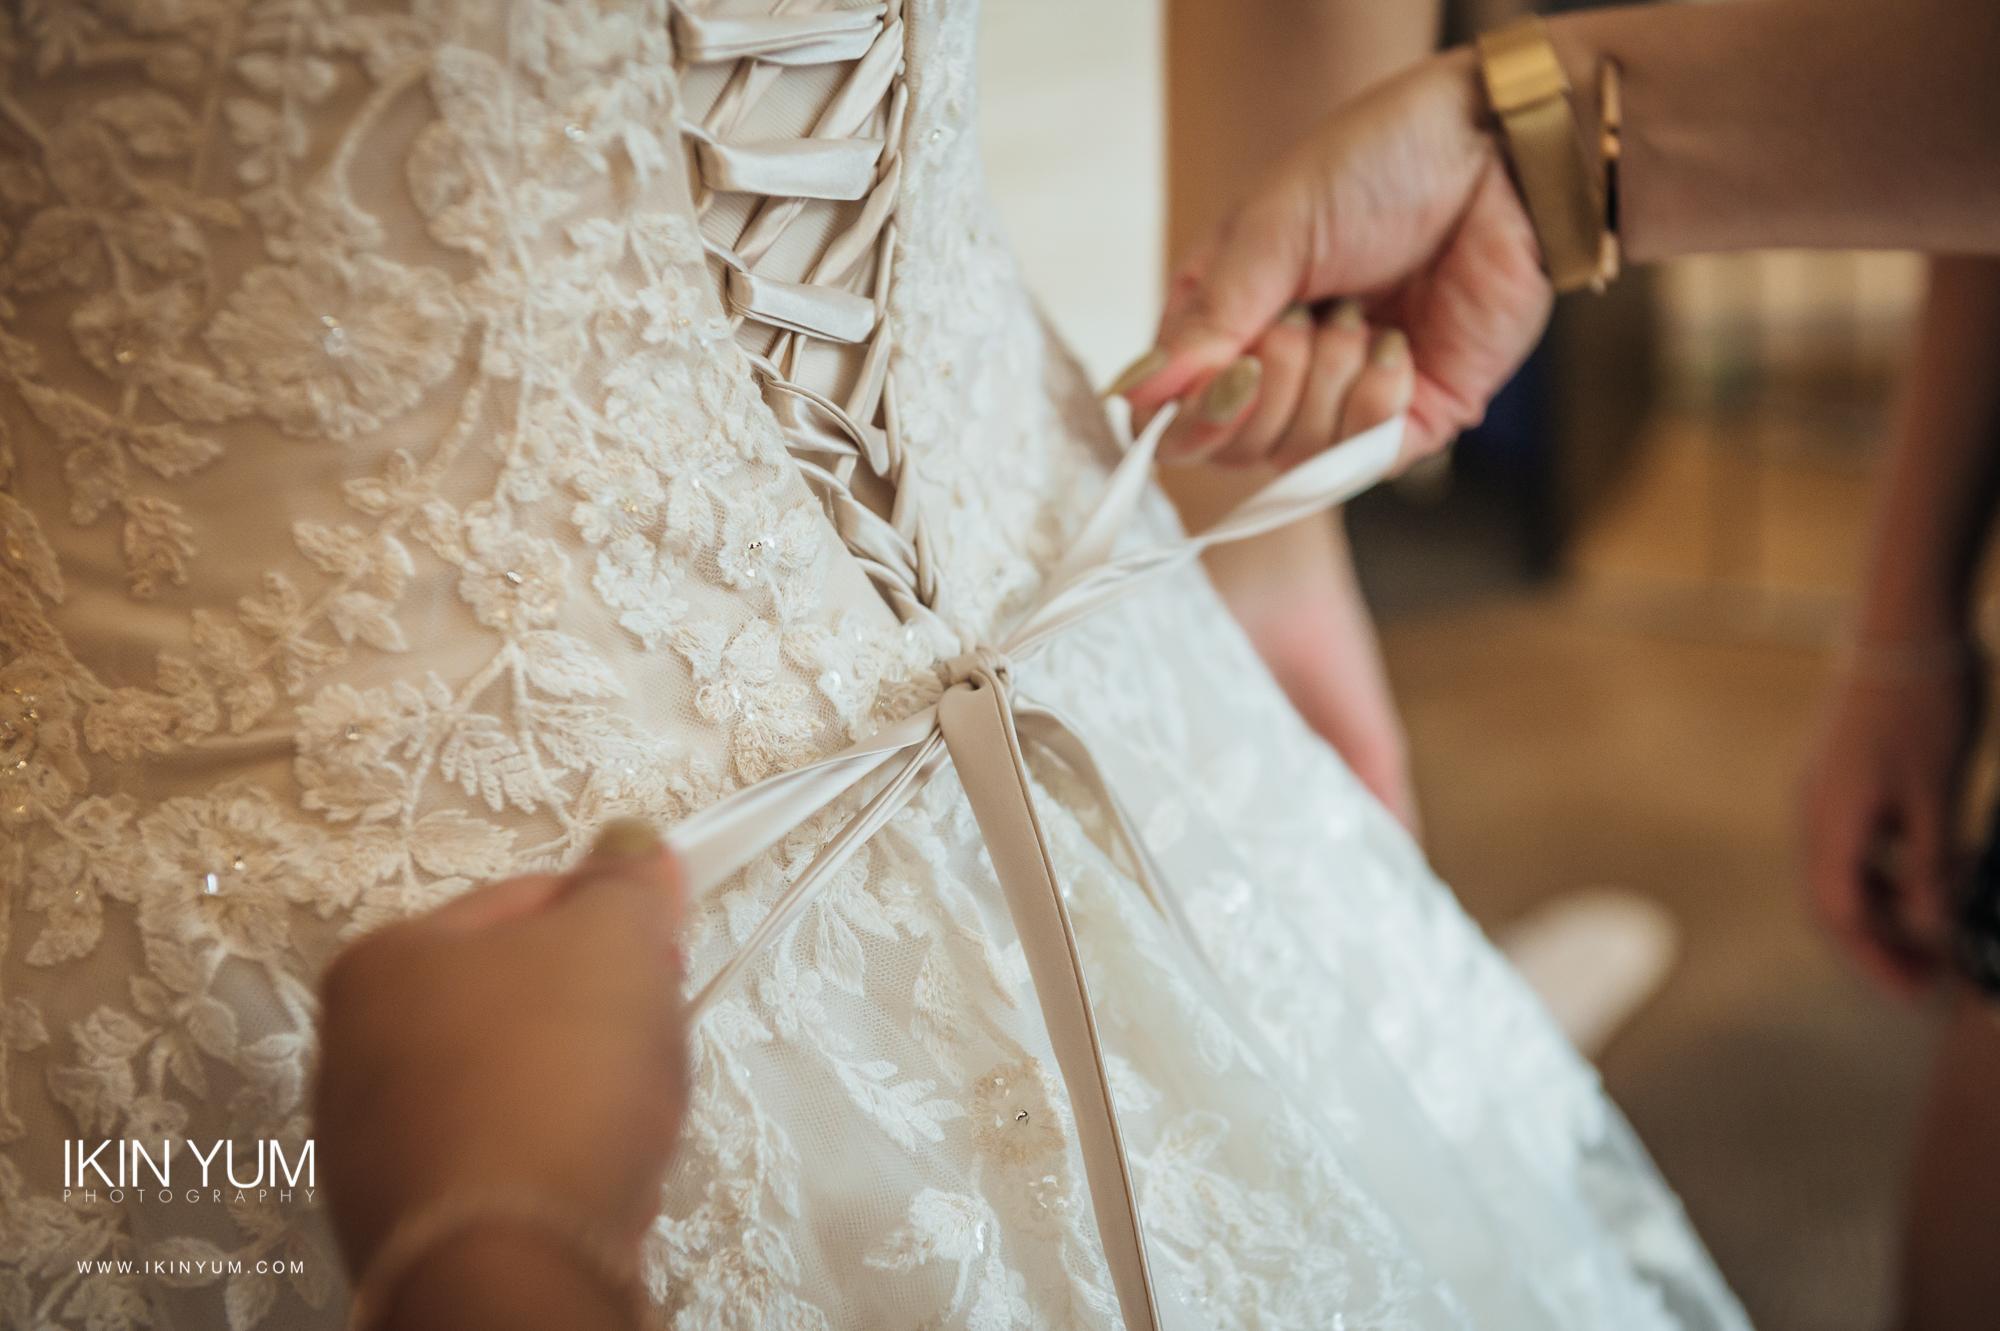 Syon Park Wedding - Ikin Yum Photography -025.jpg